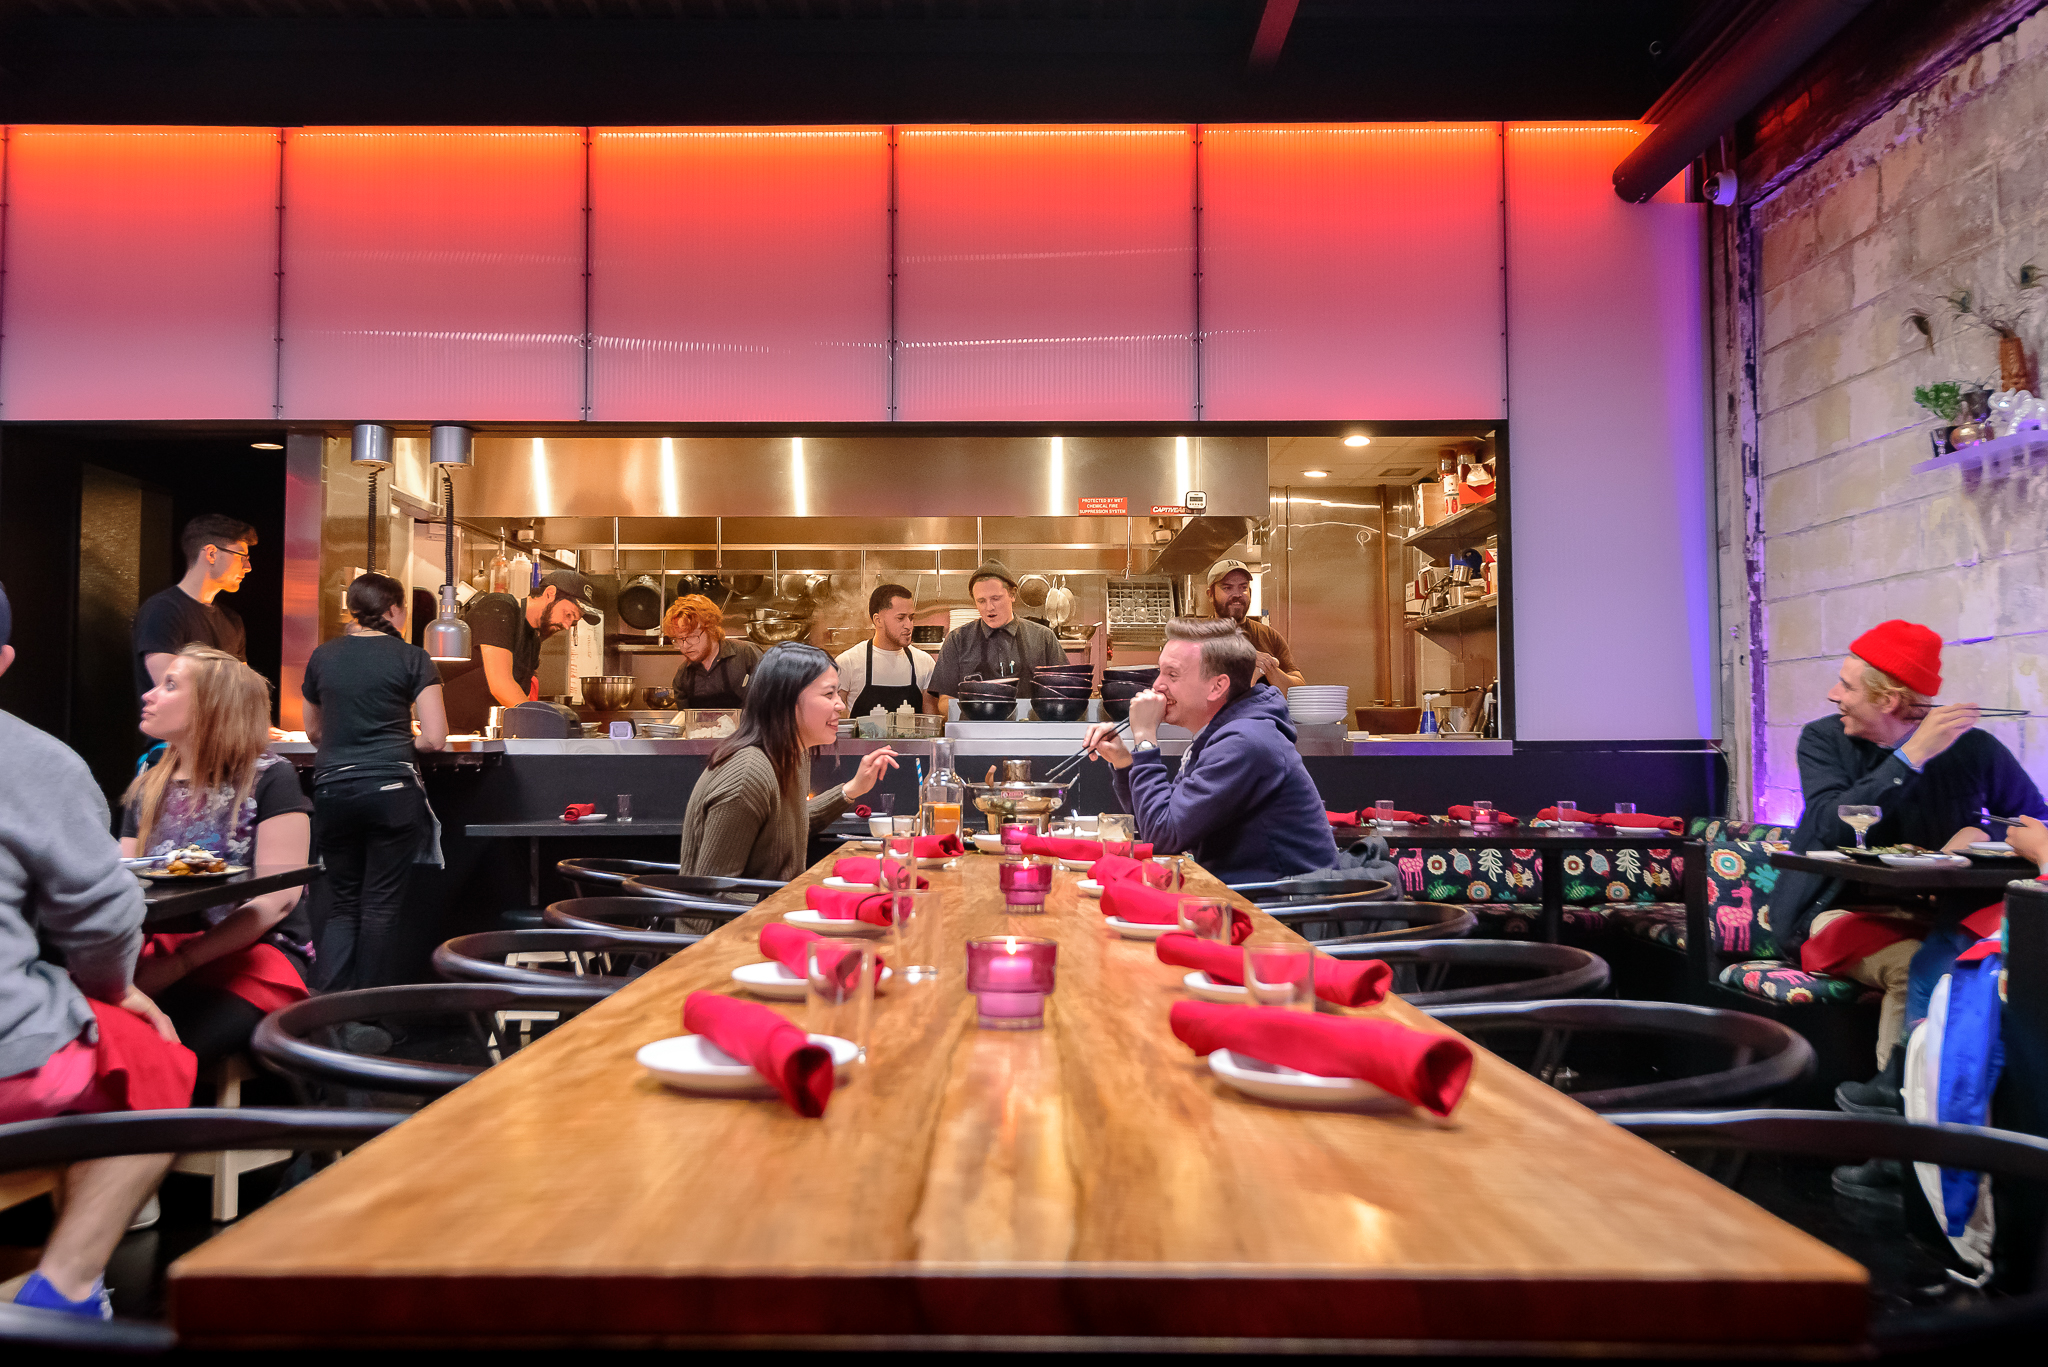 katoi_communal_table_towards_kitchen.jpg